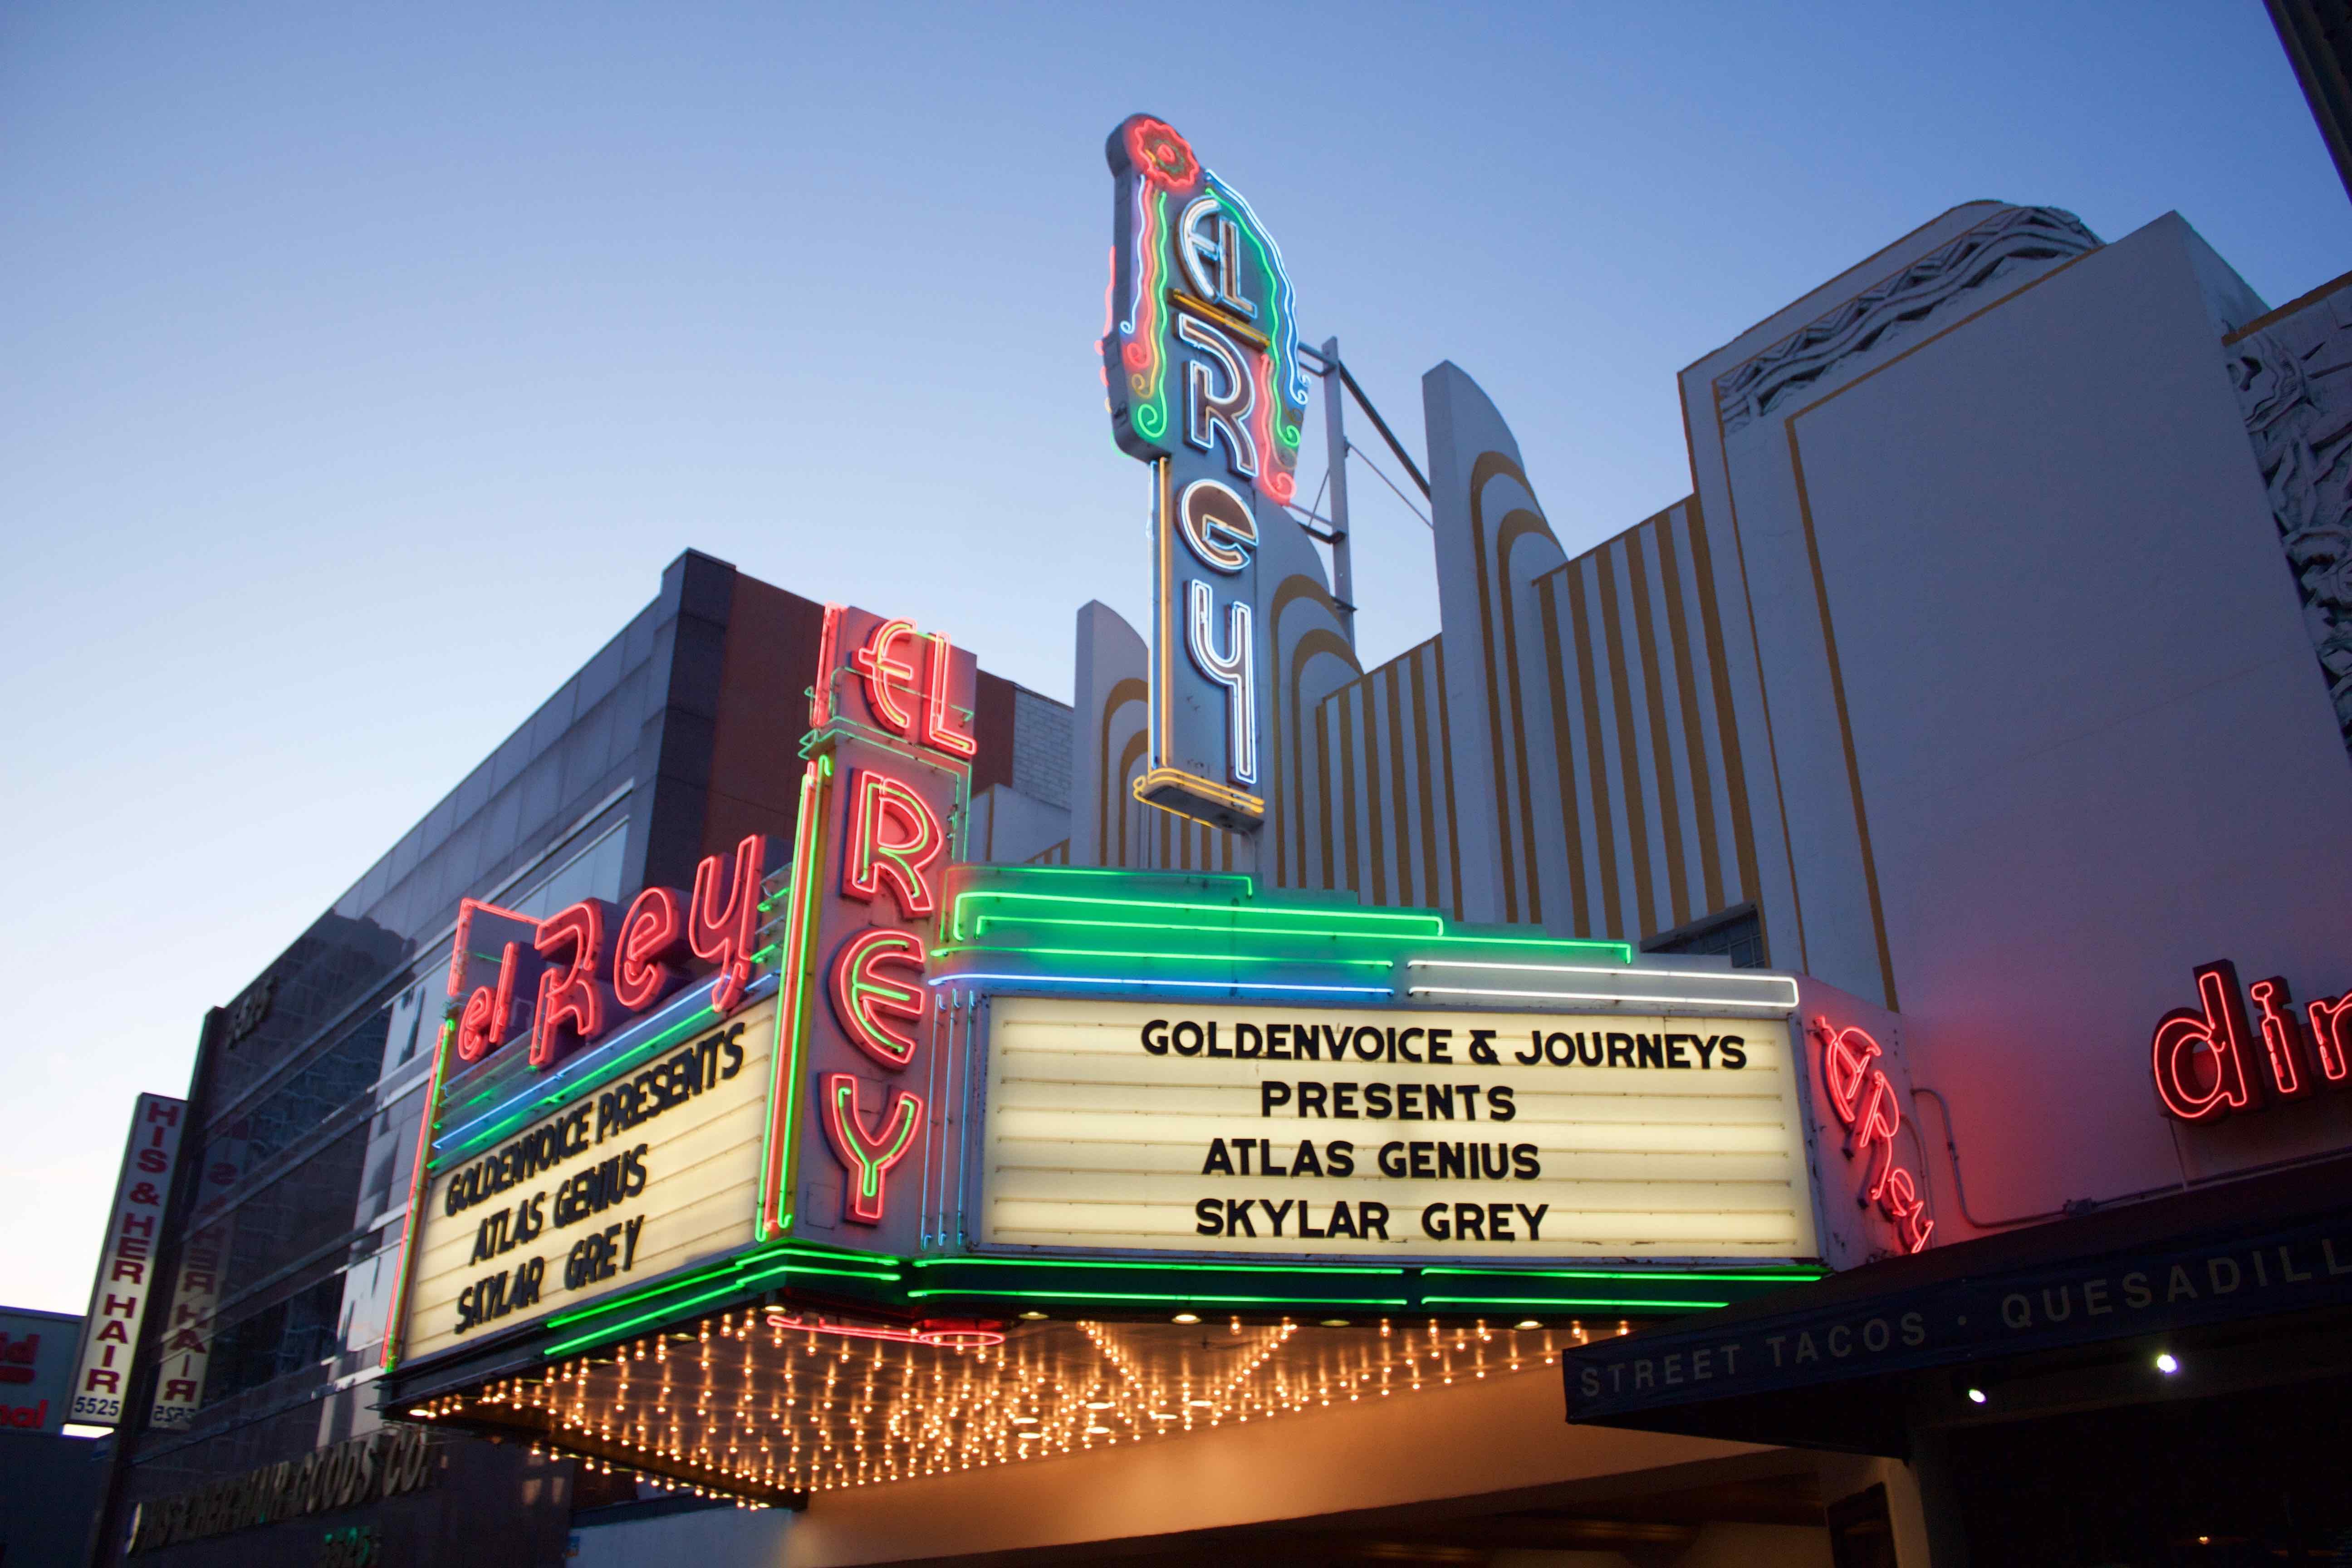 Atlas-Genius-El-Rey-Theatre-Concert-Photo-By-Derrick-K-Lee